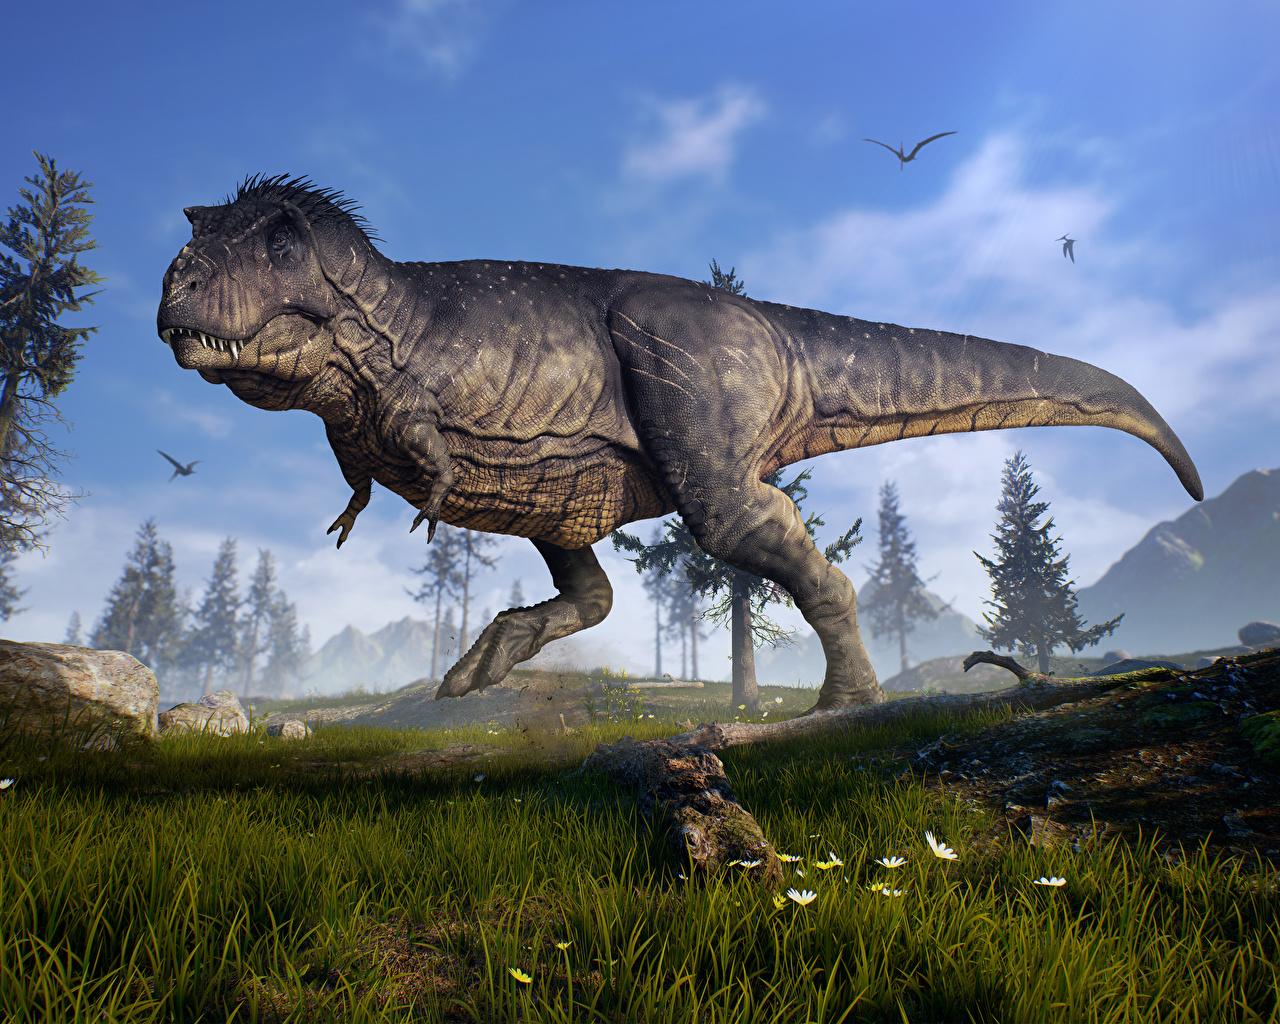 picture tyrannosaurus rex dinosaurs 3d graphics grass closeup